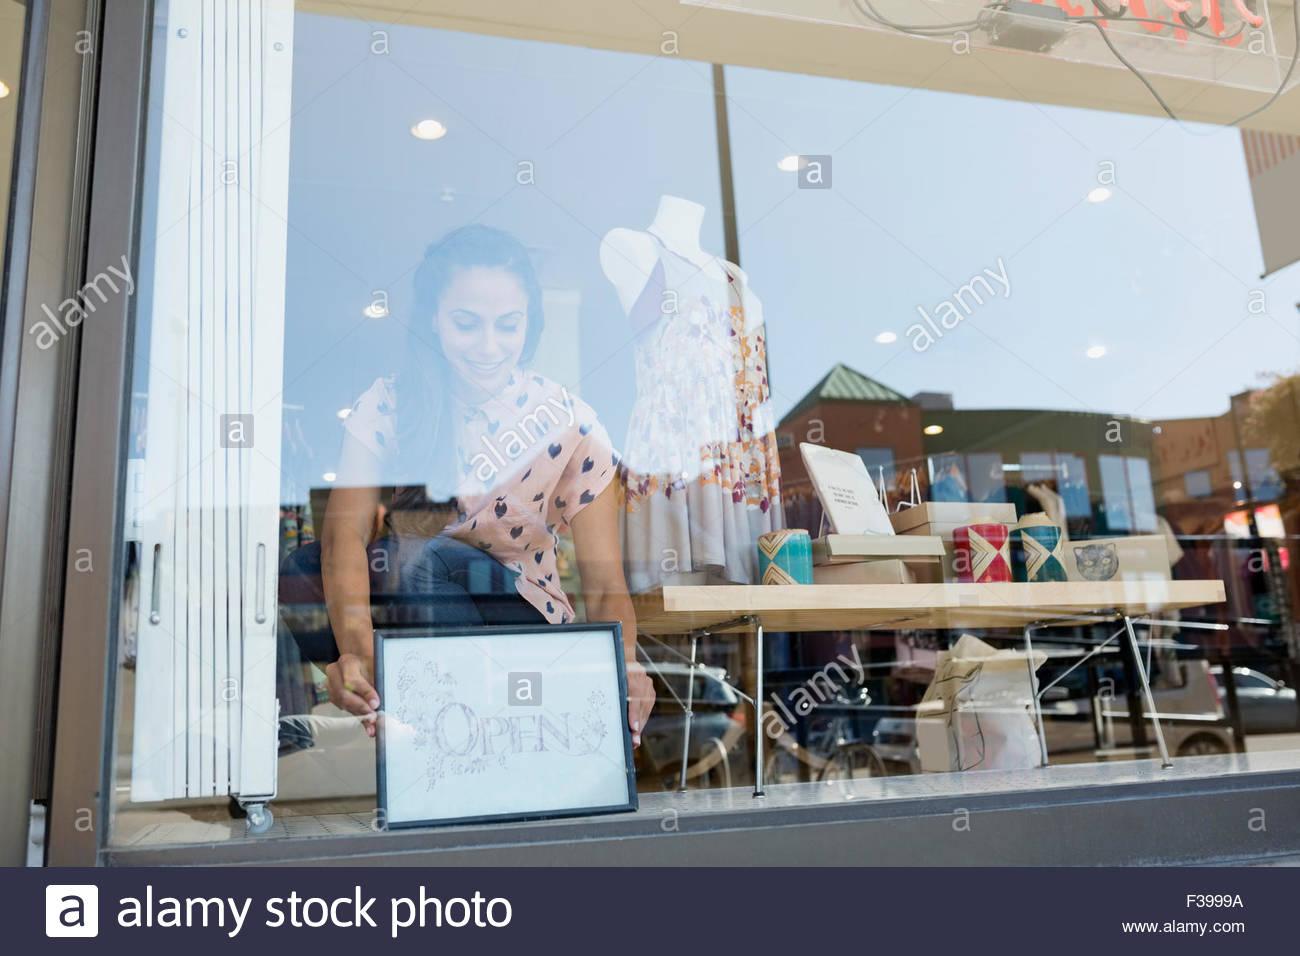 Worker placing open sign in shop window - Stock Image